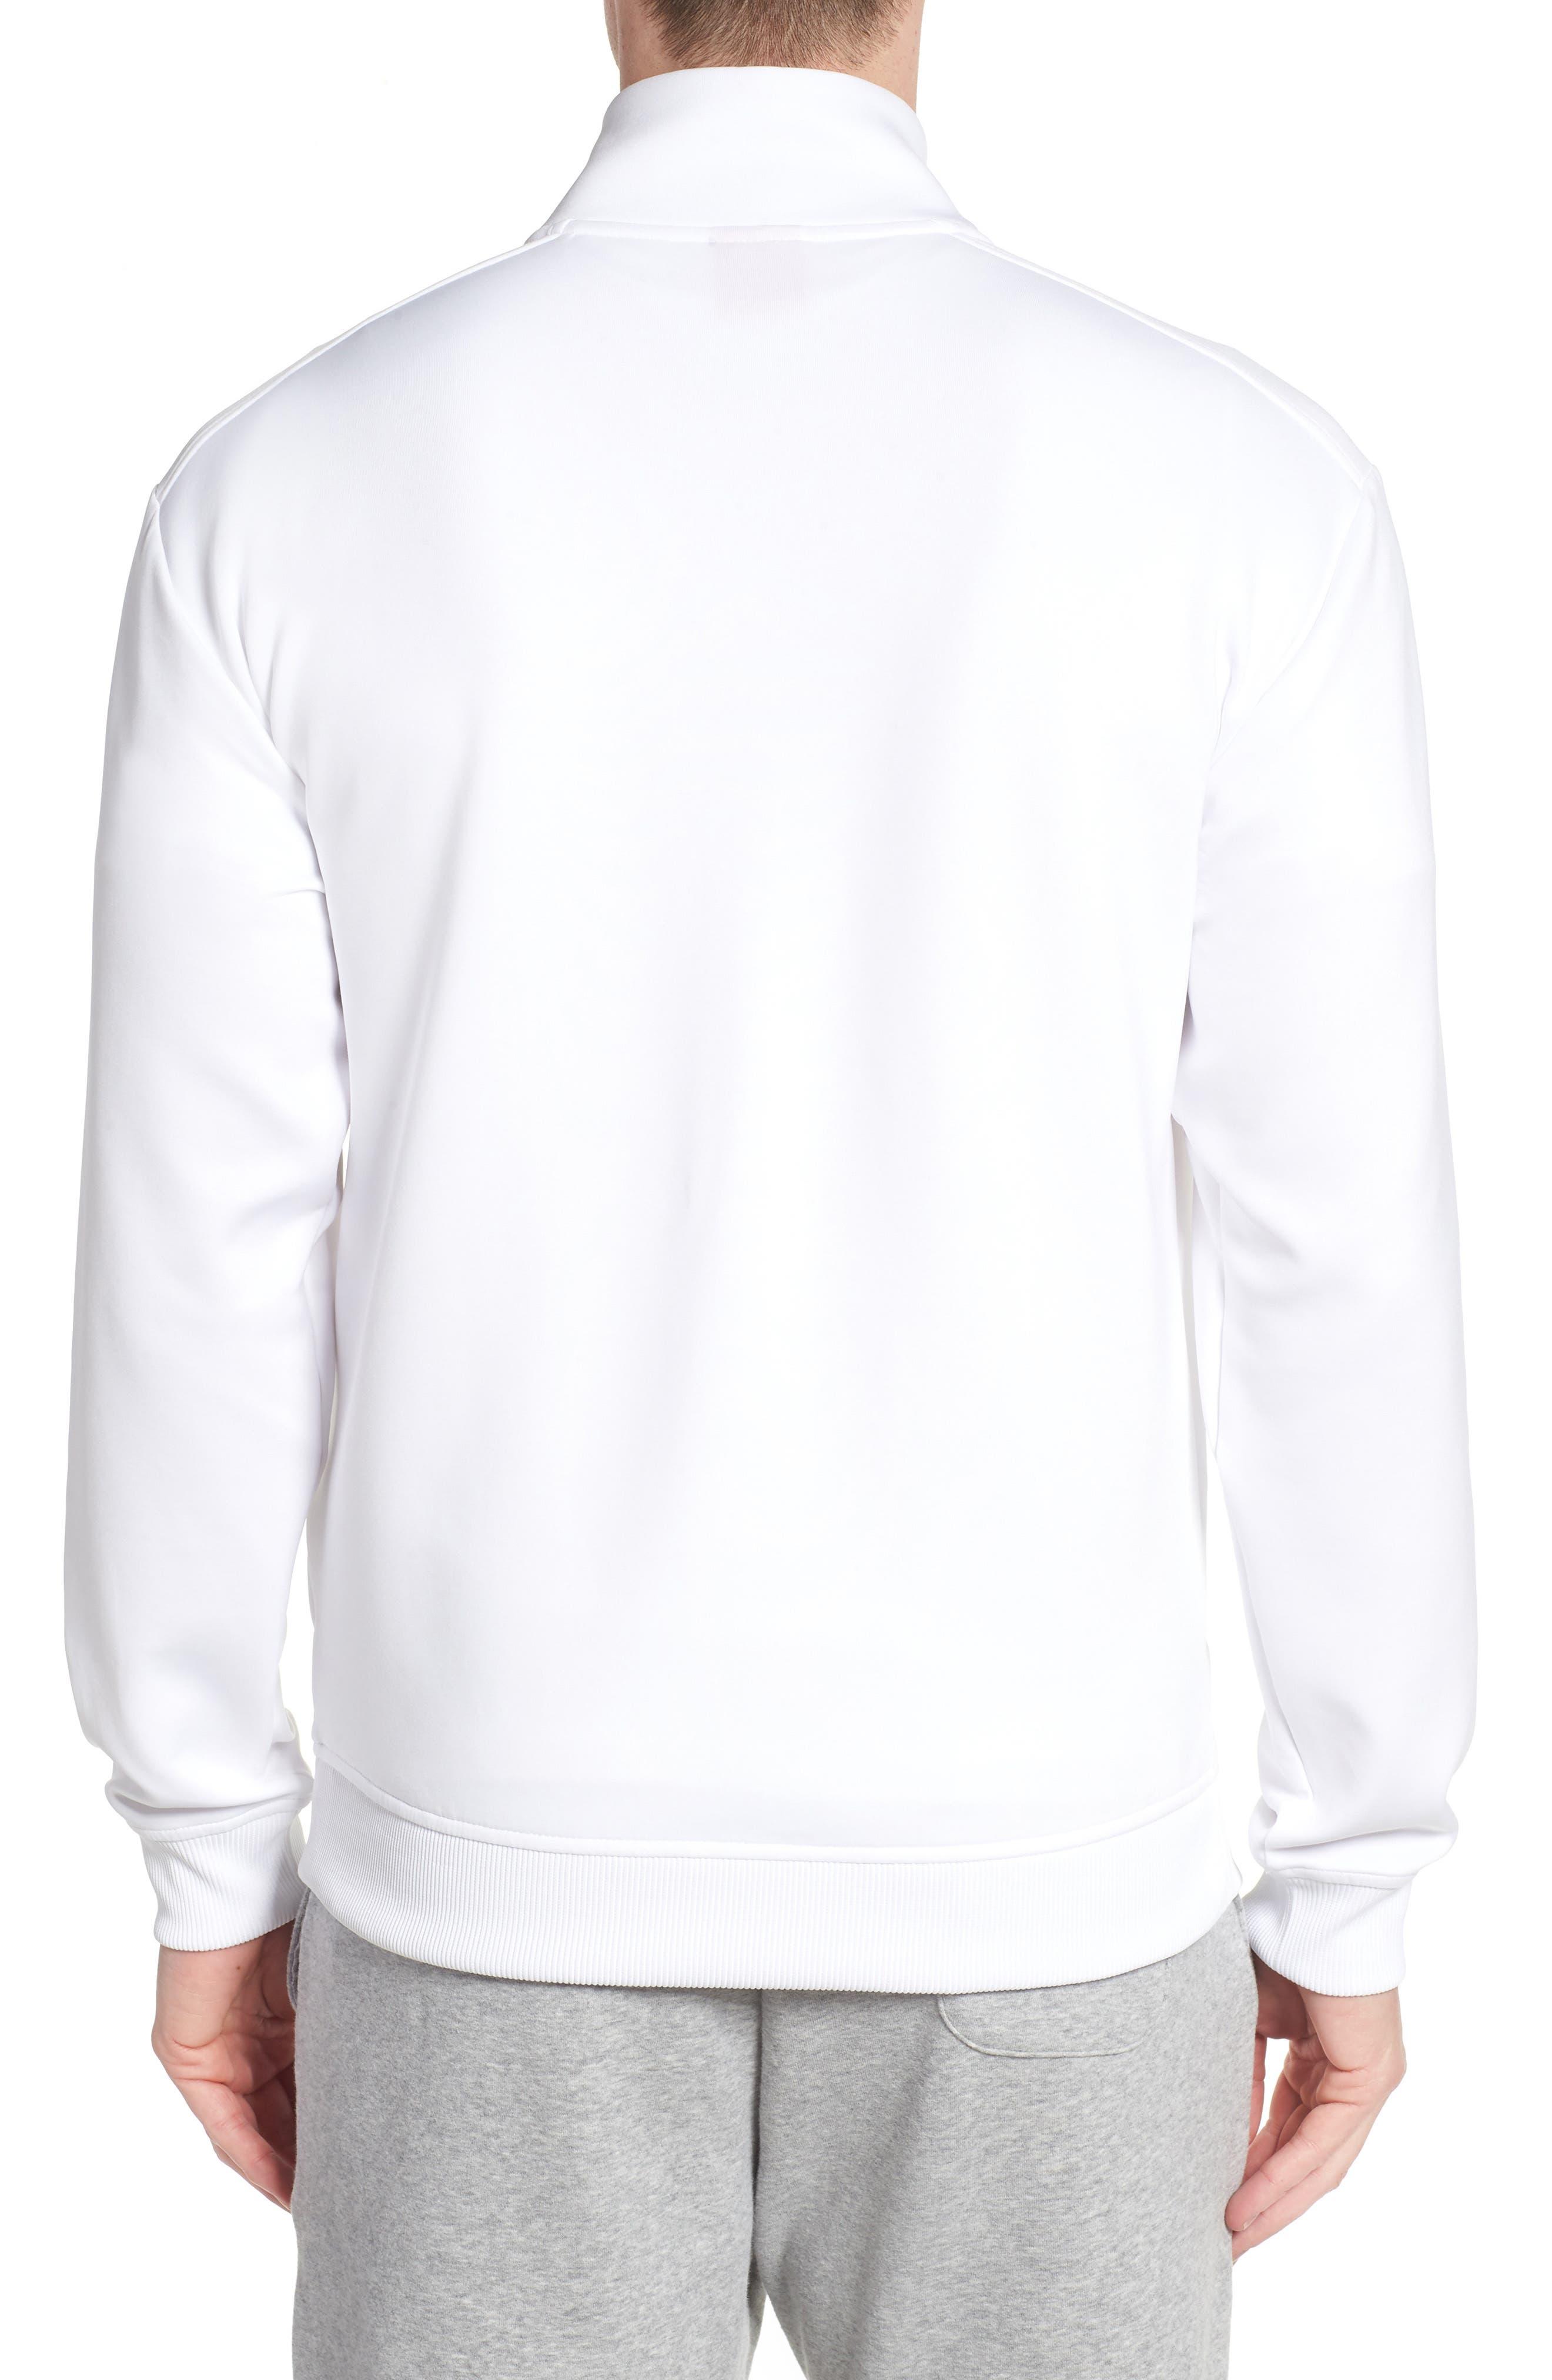 Athletics Track Jacket,                             Alternate thumbnail 2, color,                             100